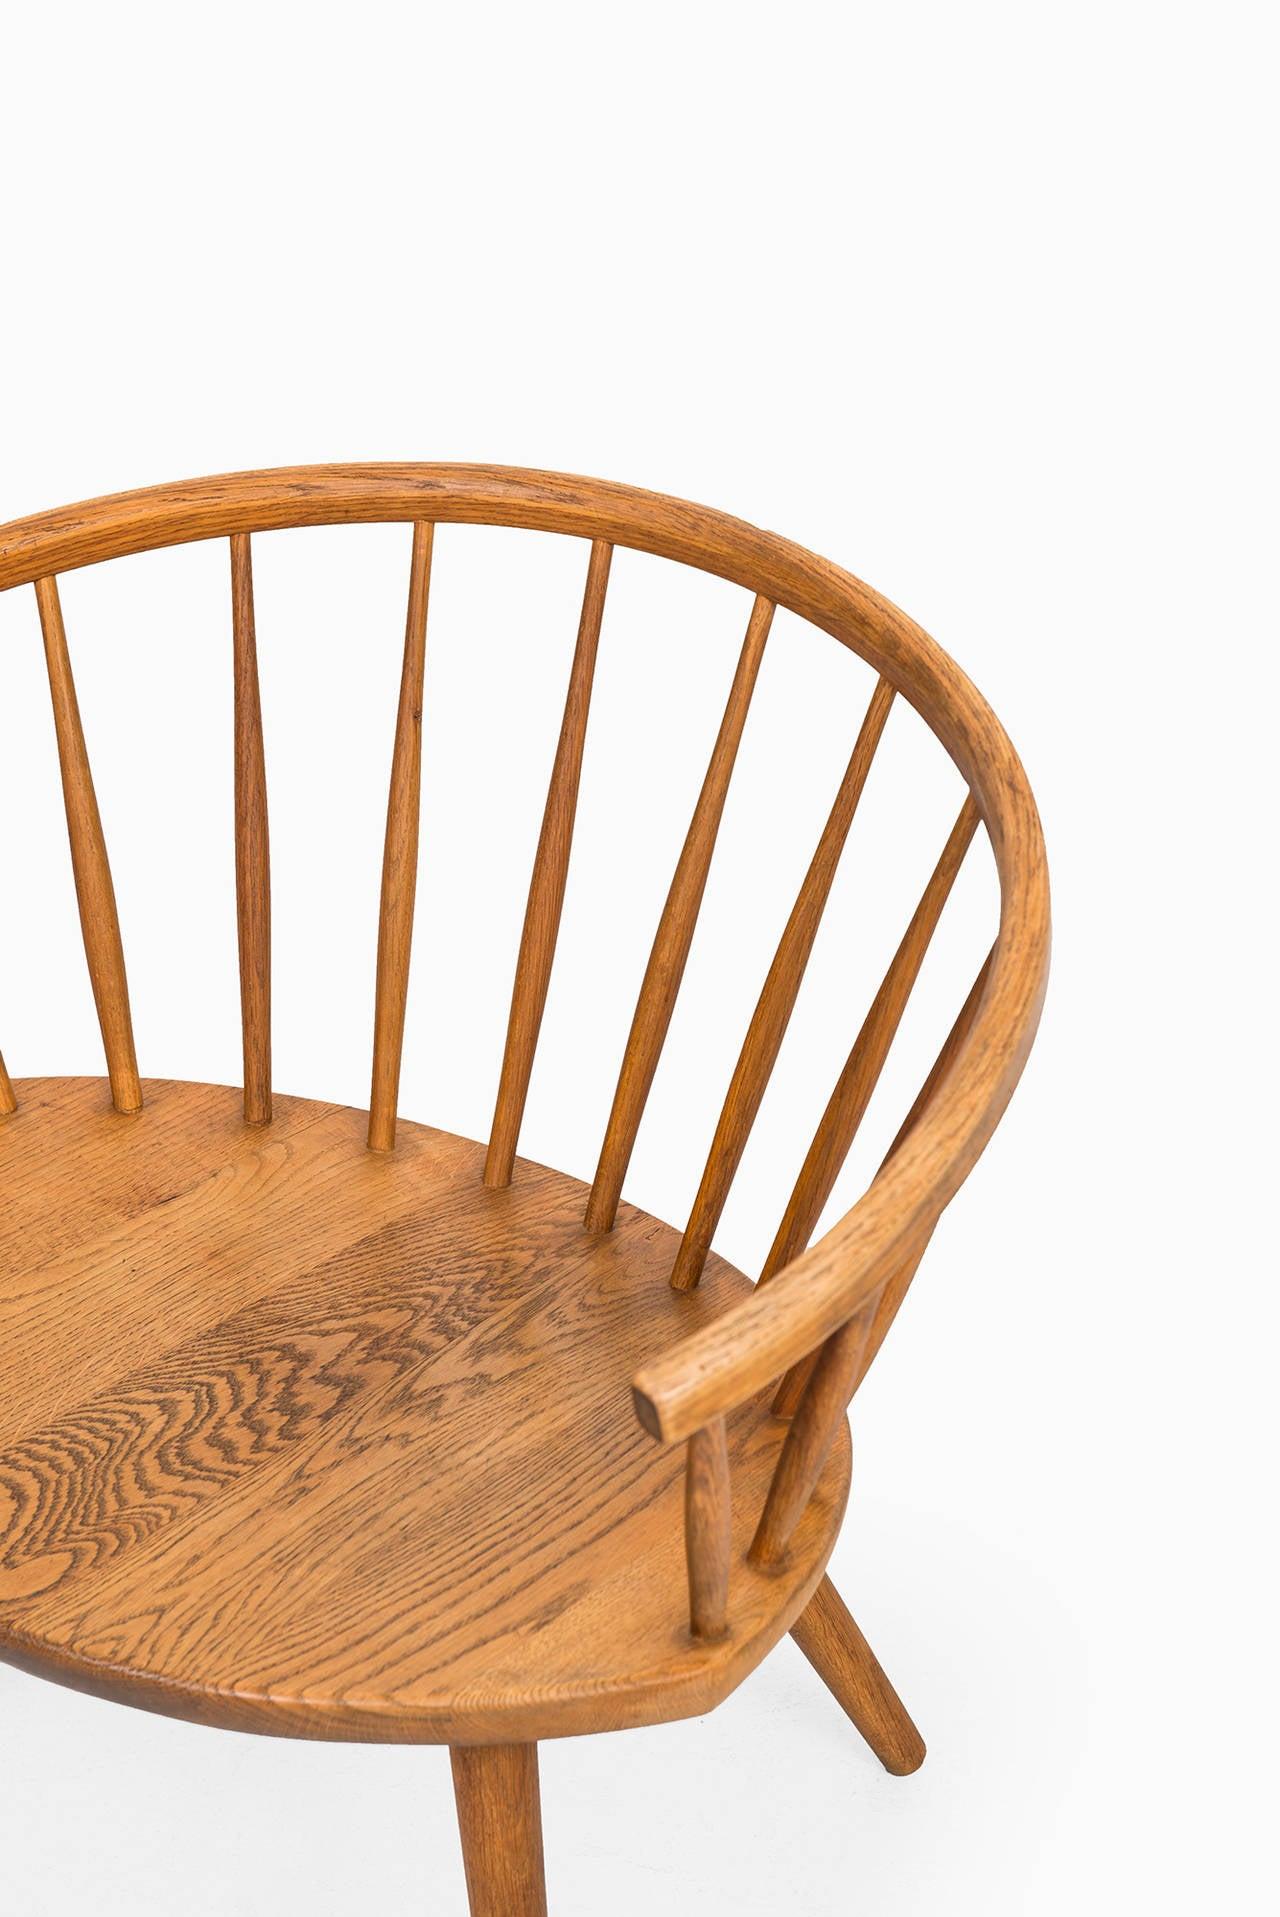 Yngve Ekström Easy Chair, Model Arka by Stolab in Sweden at 1stdibs